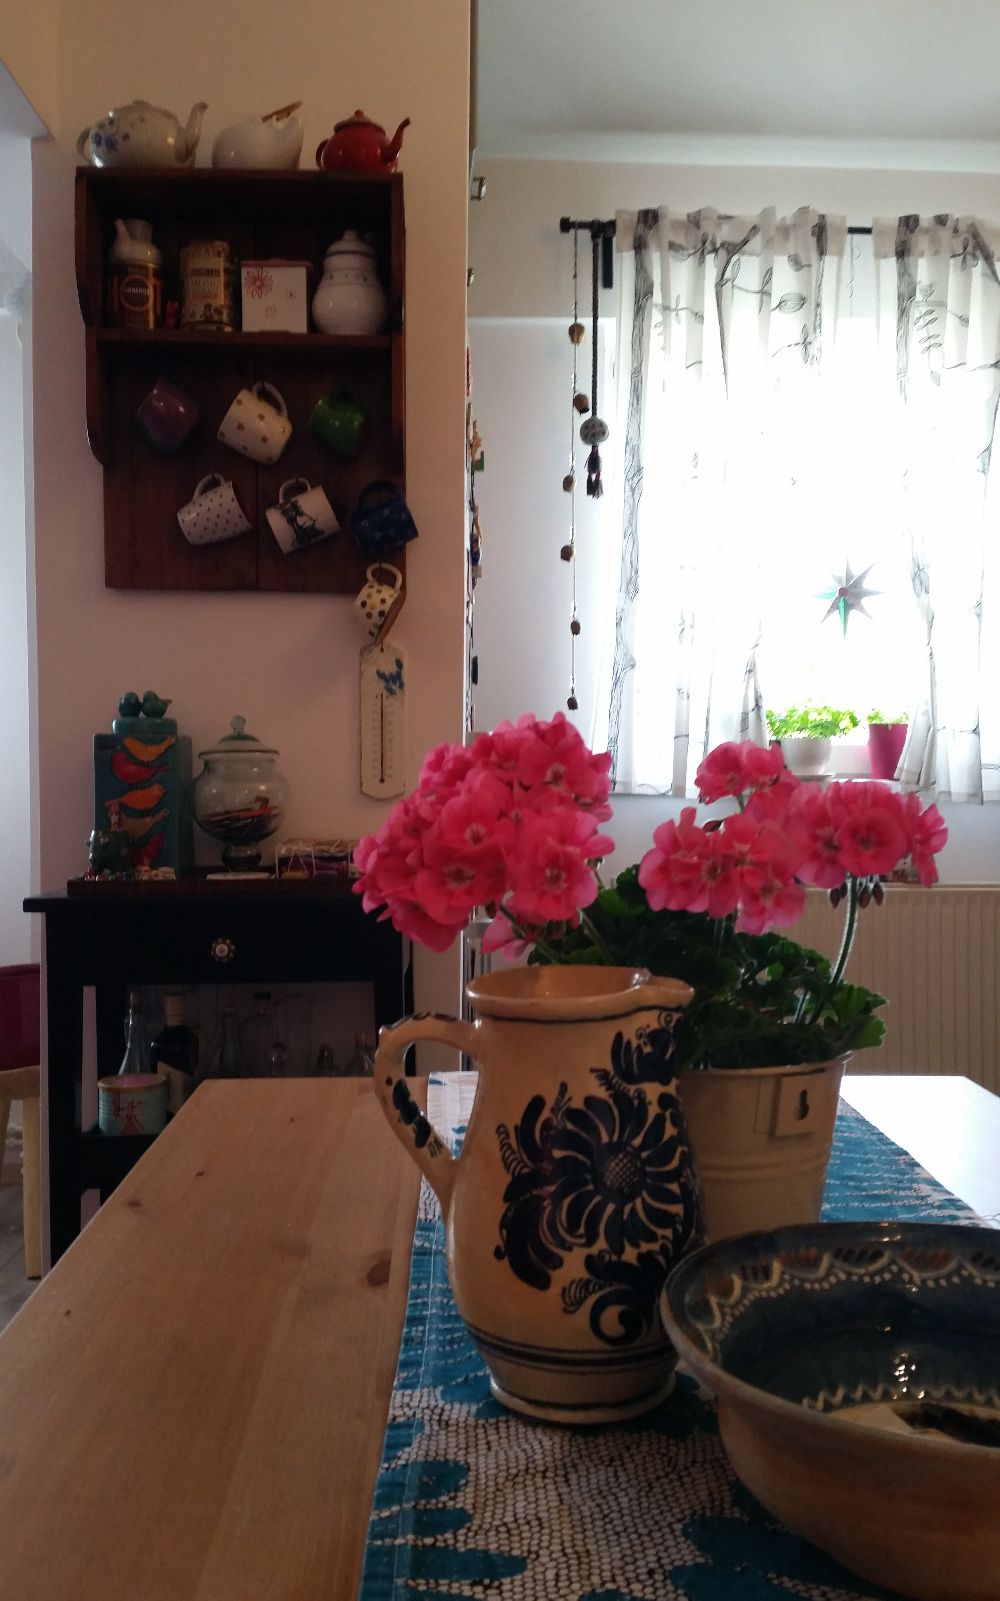 adelaparvu.com despre apartament 3 camere colorat in Sibiu, Foto Adela Parvu (46)